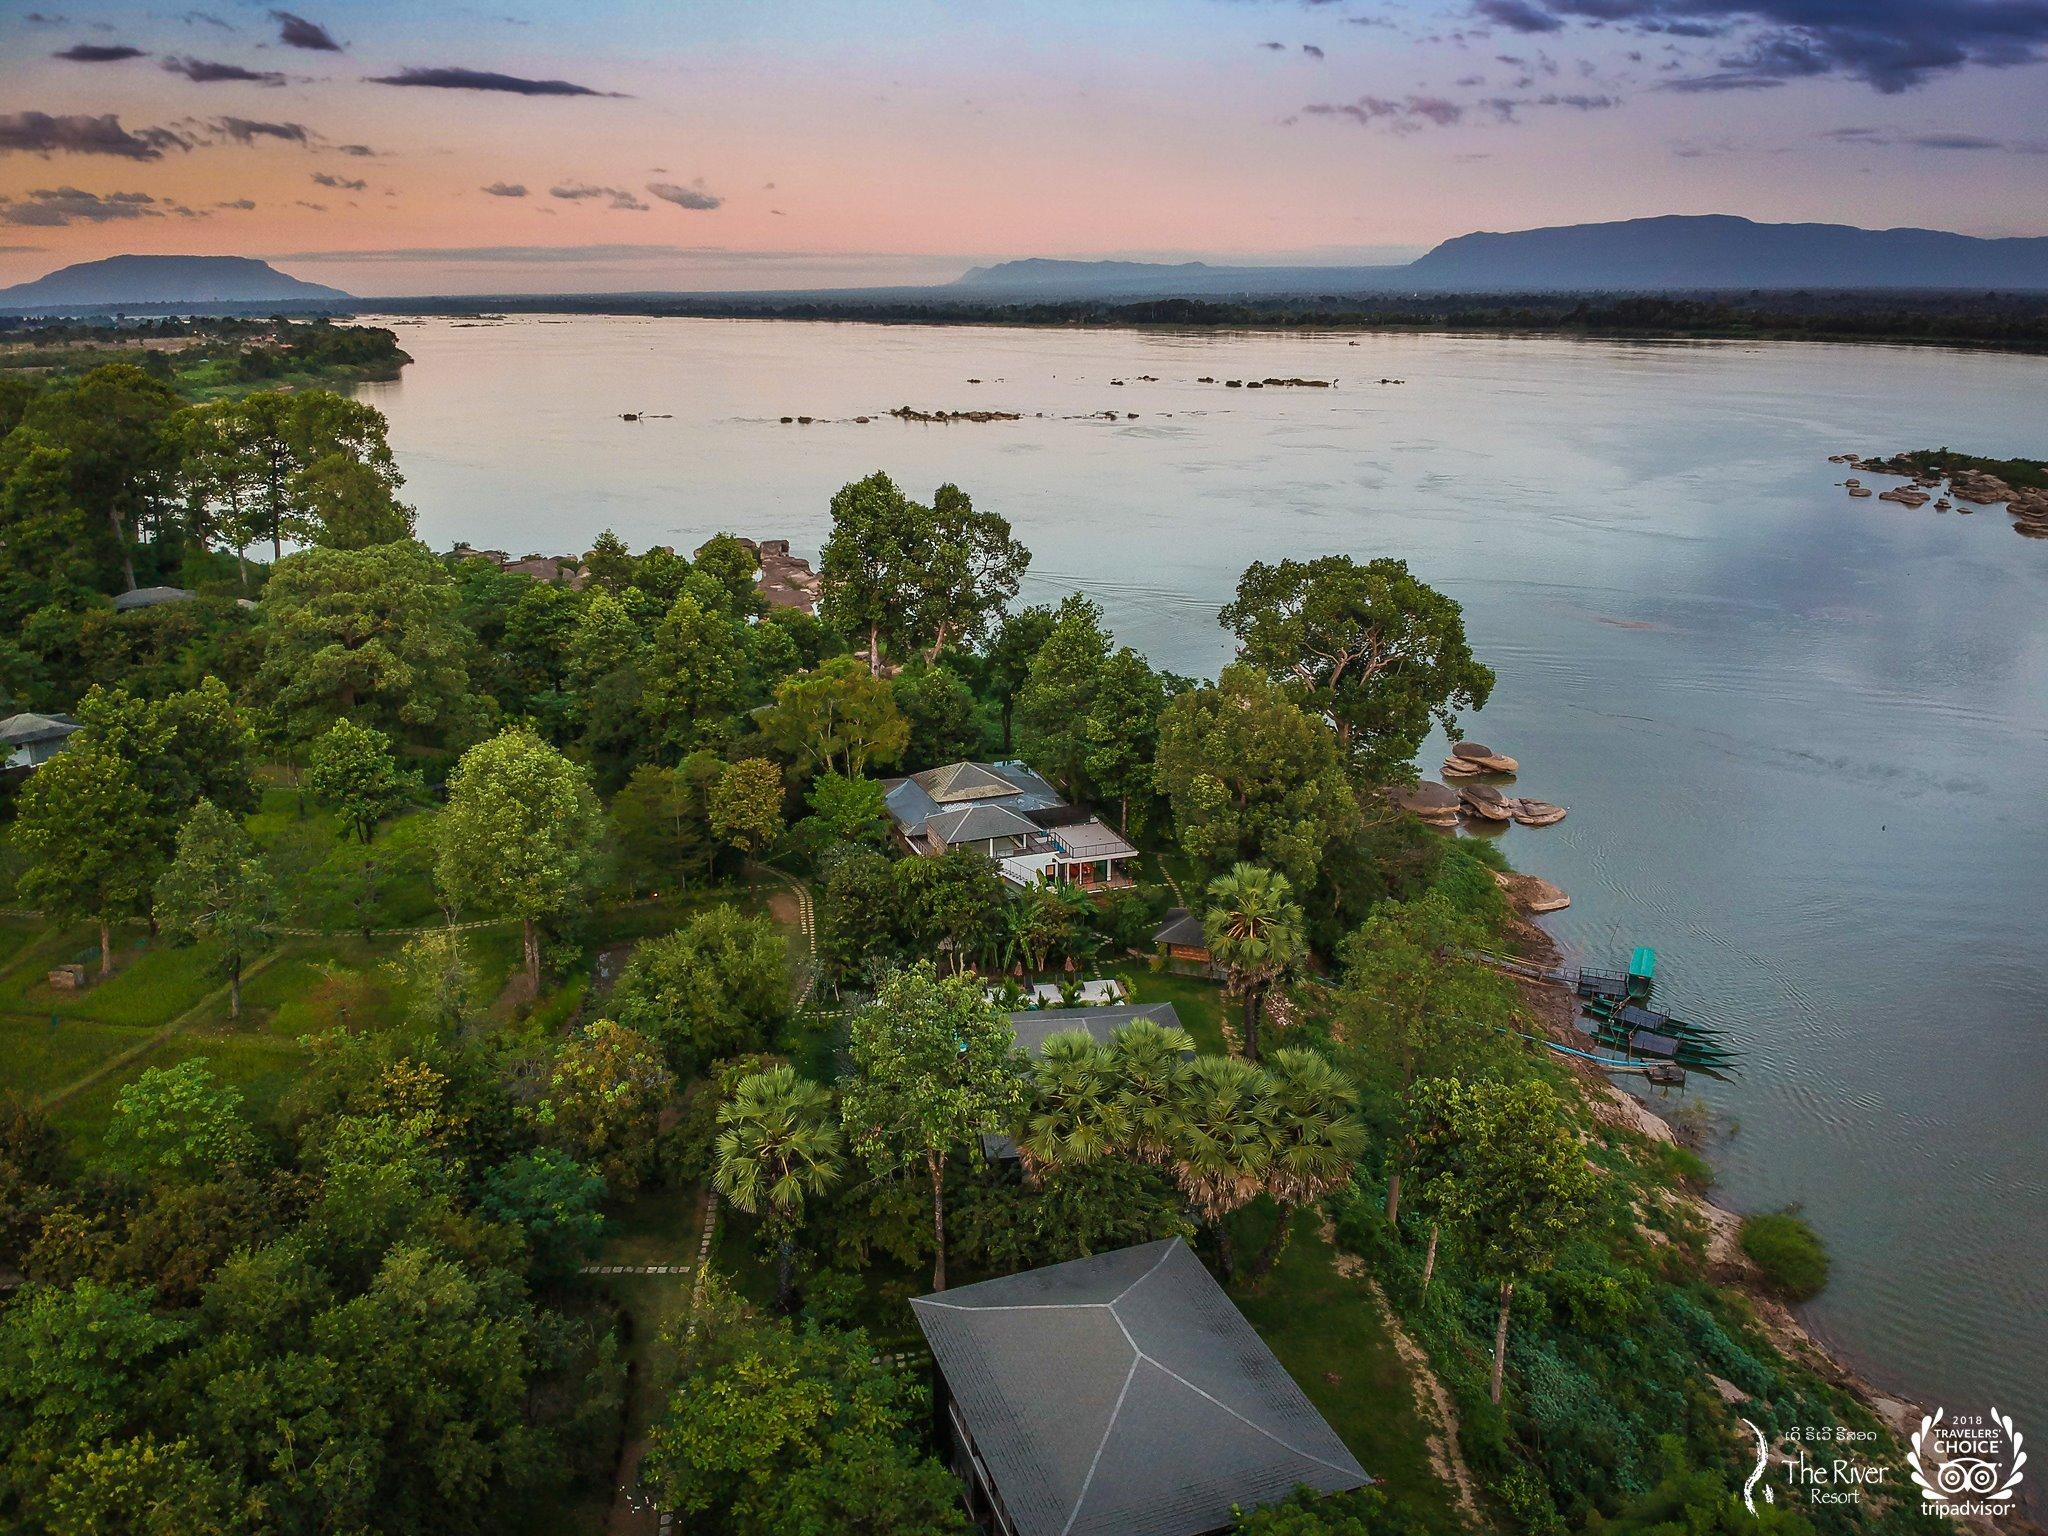 laos-the-river-resort-4000-isole.jpg